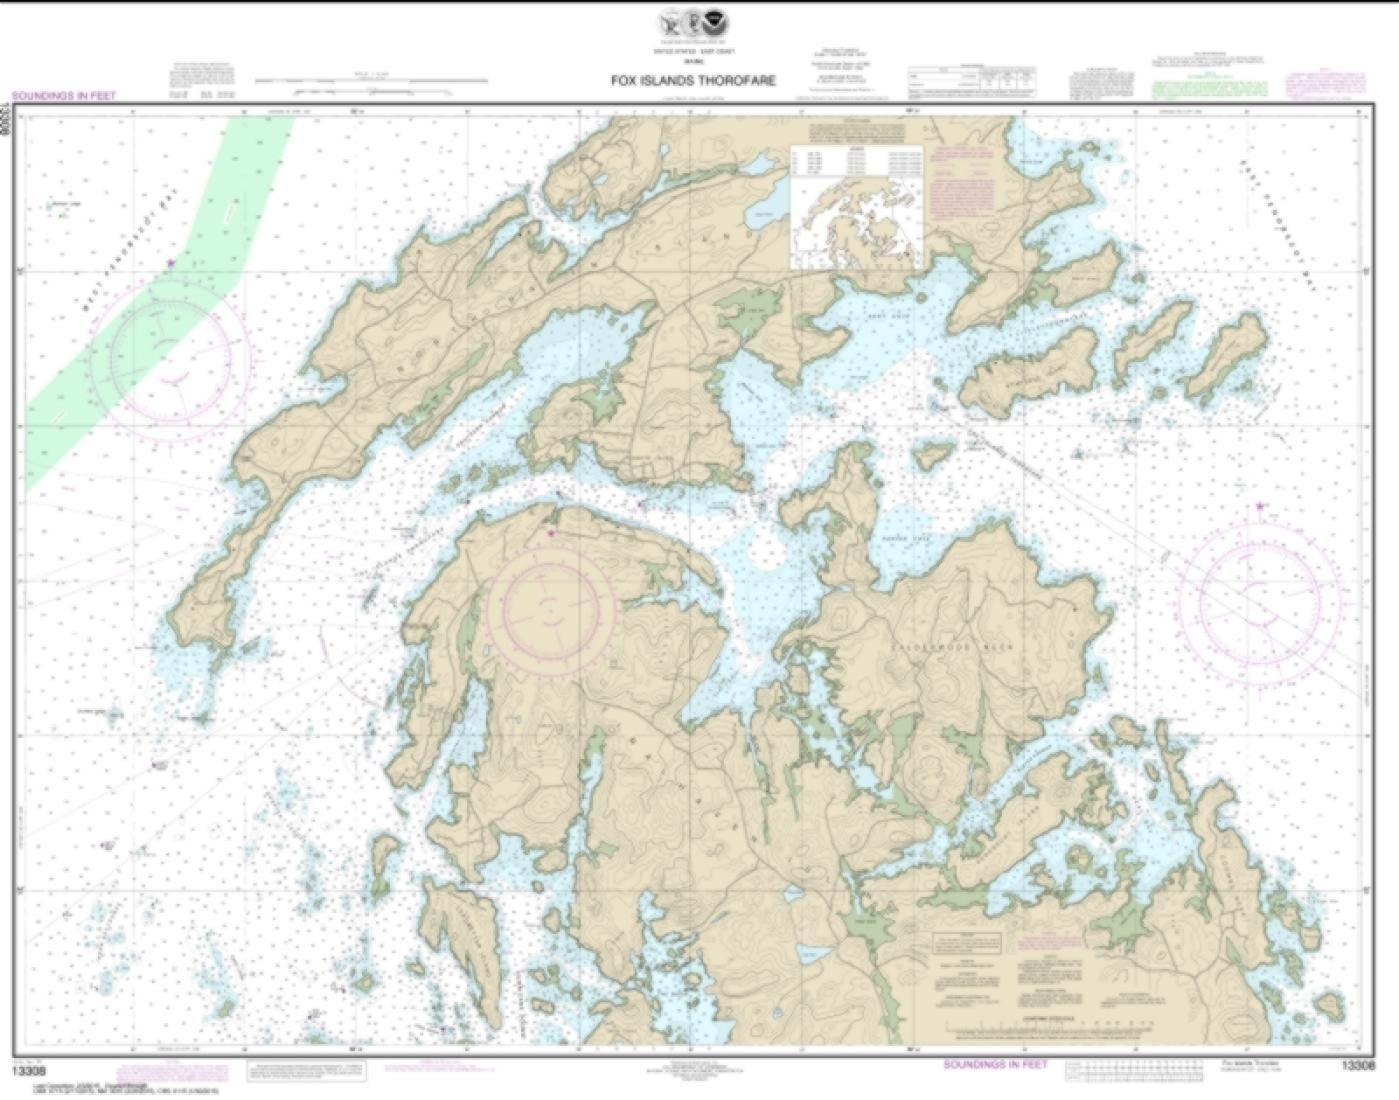 Fox Islands Thorofare 13308 13 By Noaa Nautical Chart Wall Art Prints Sailing Outfit